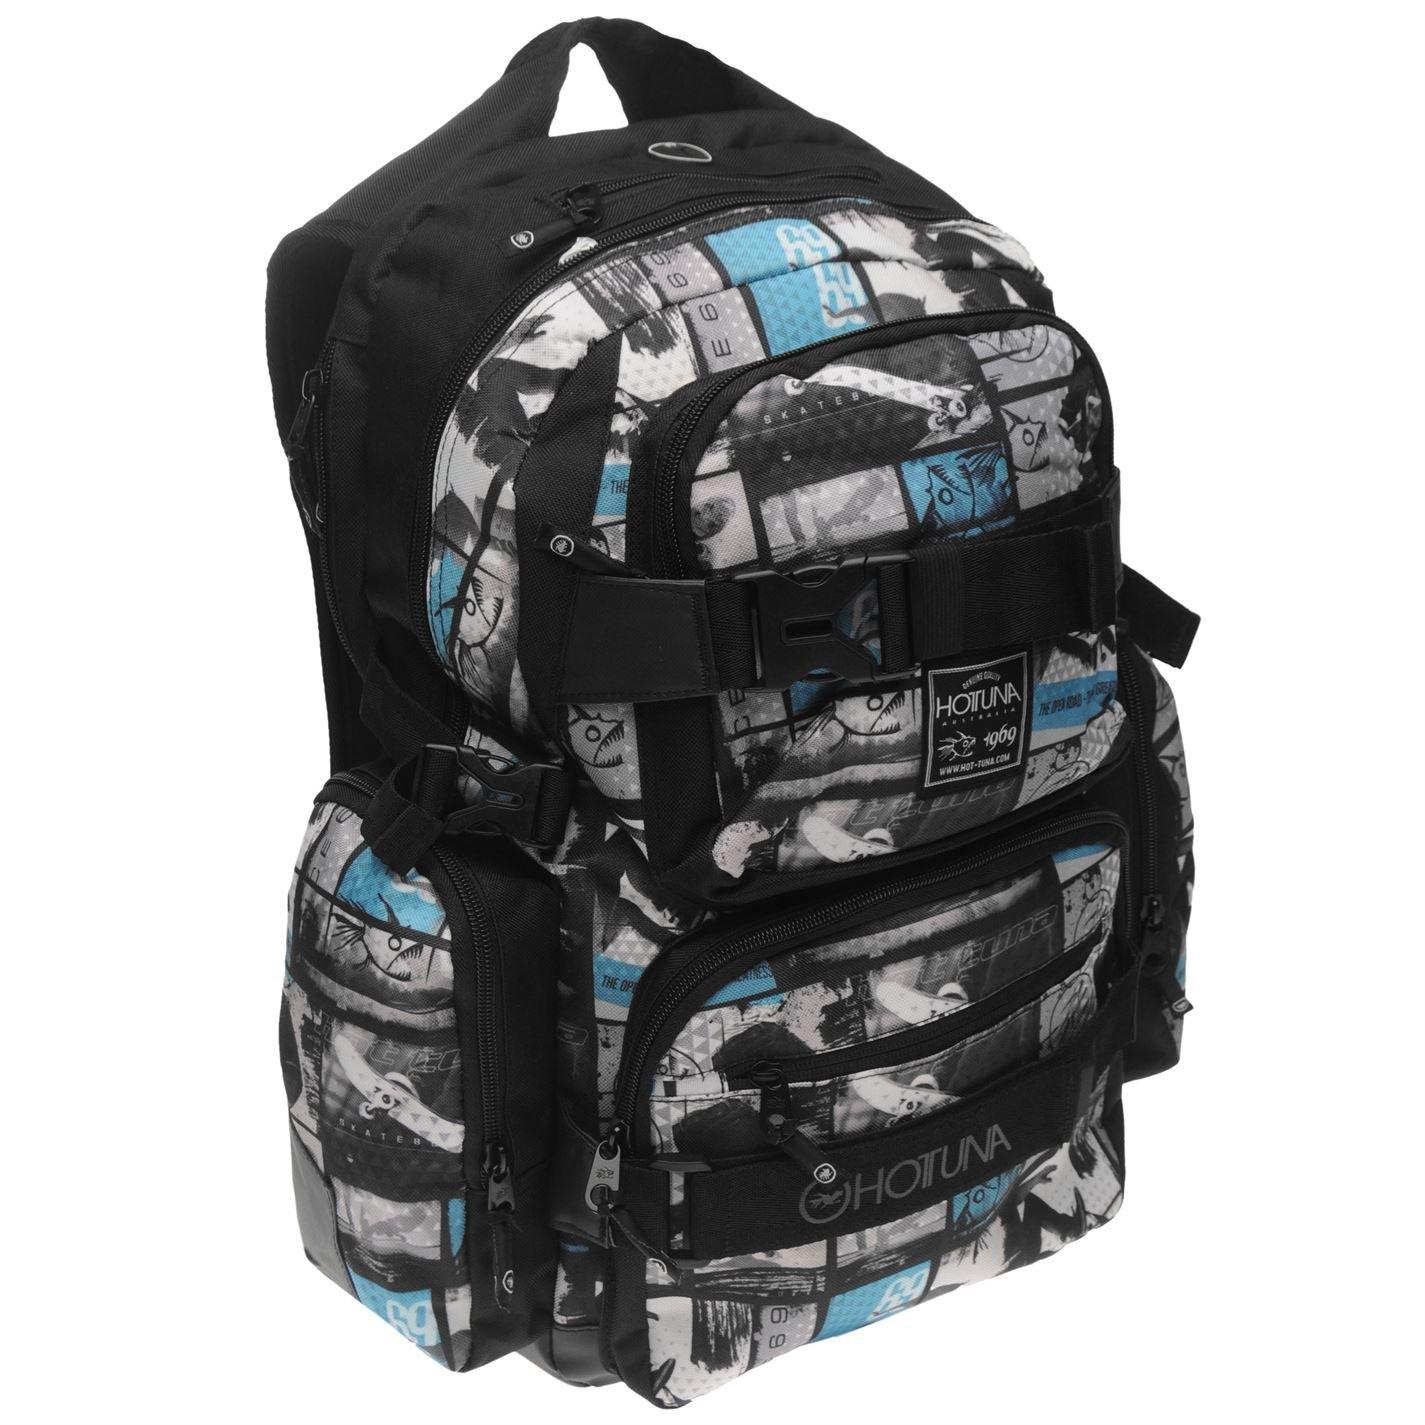 0ea7db70188f Amazon.com  Hot Tuna Skate Unisex Backpack Photoprint  Shoes